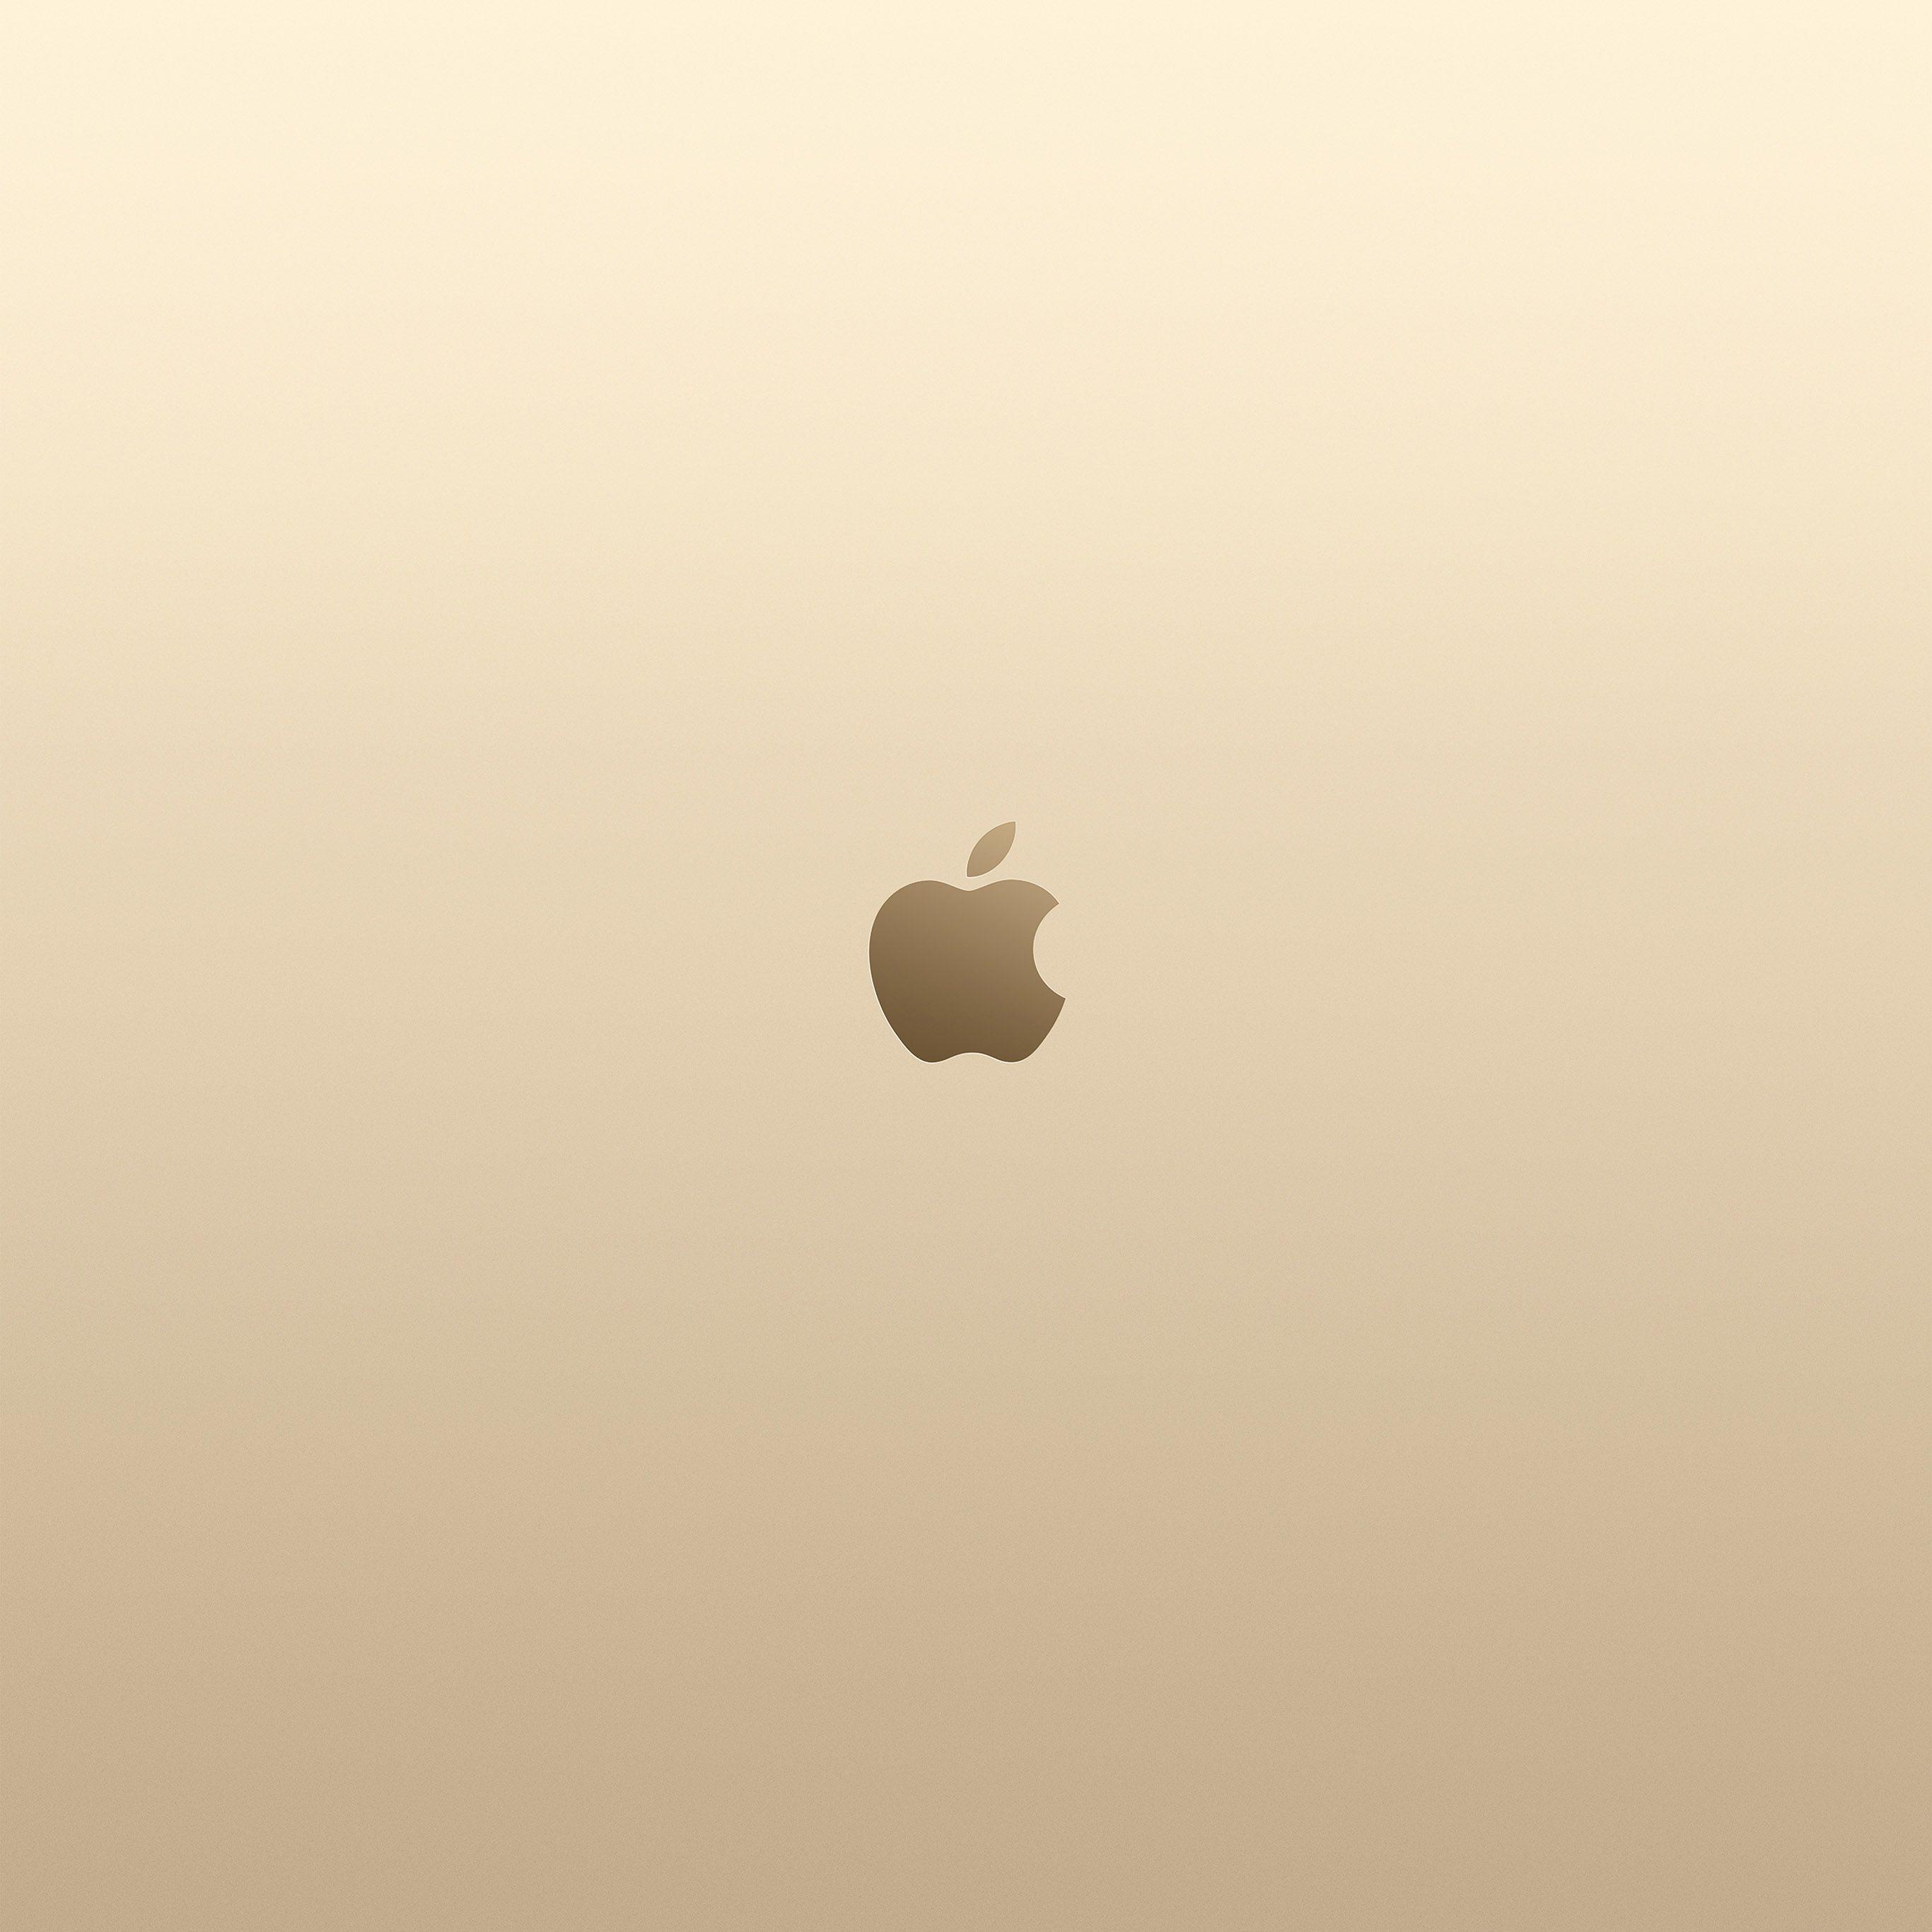 Gold Apple Wallpapers on WallpaperDog